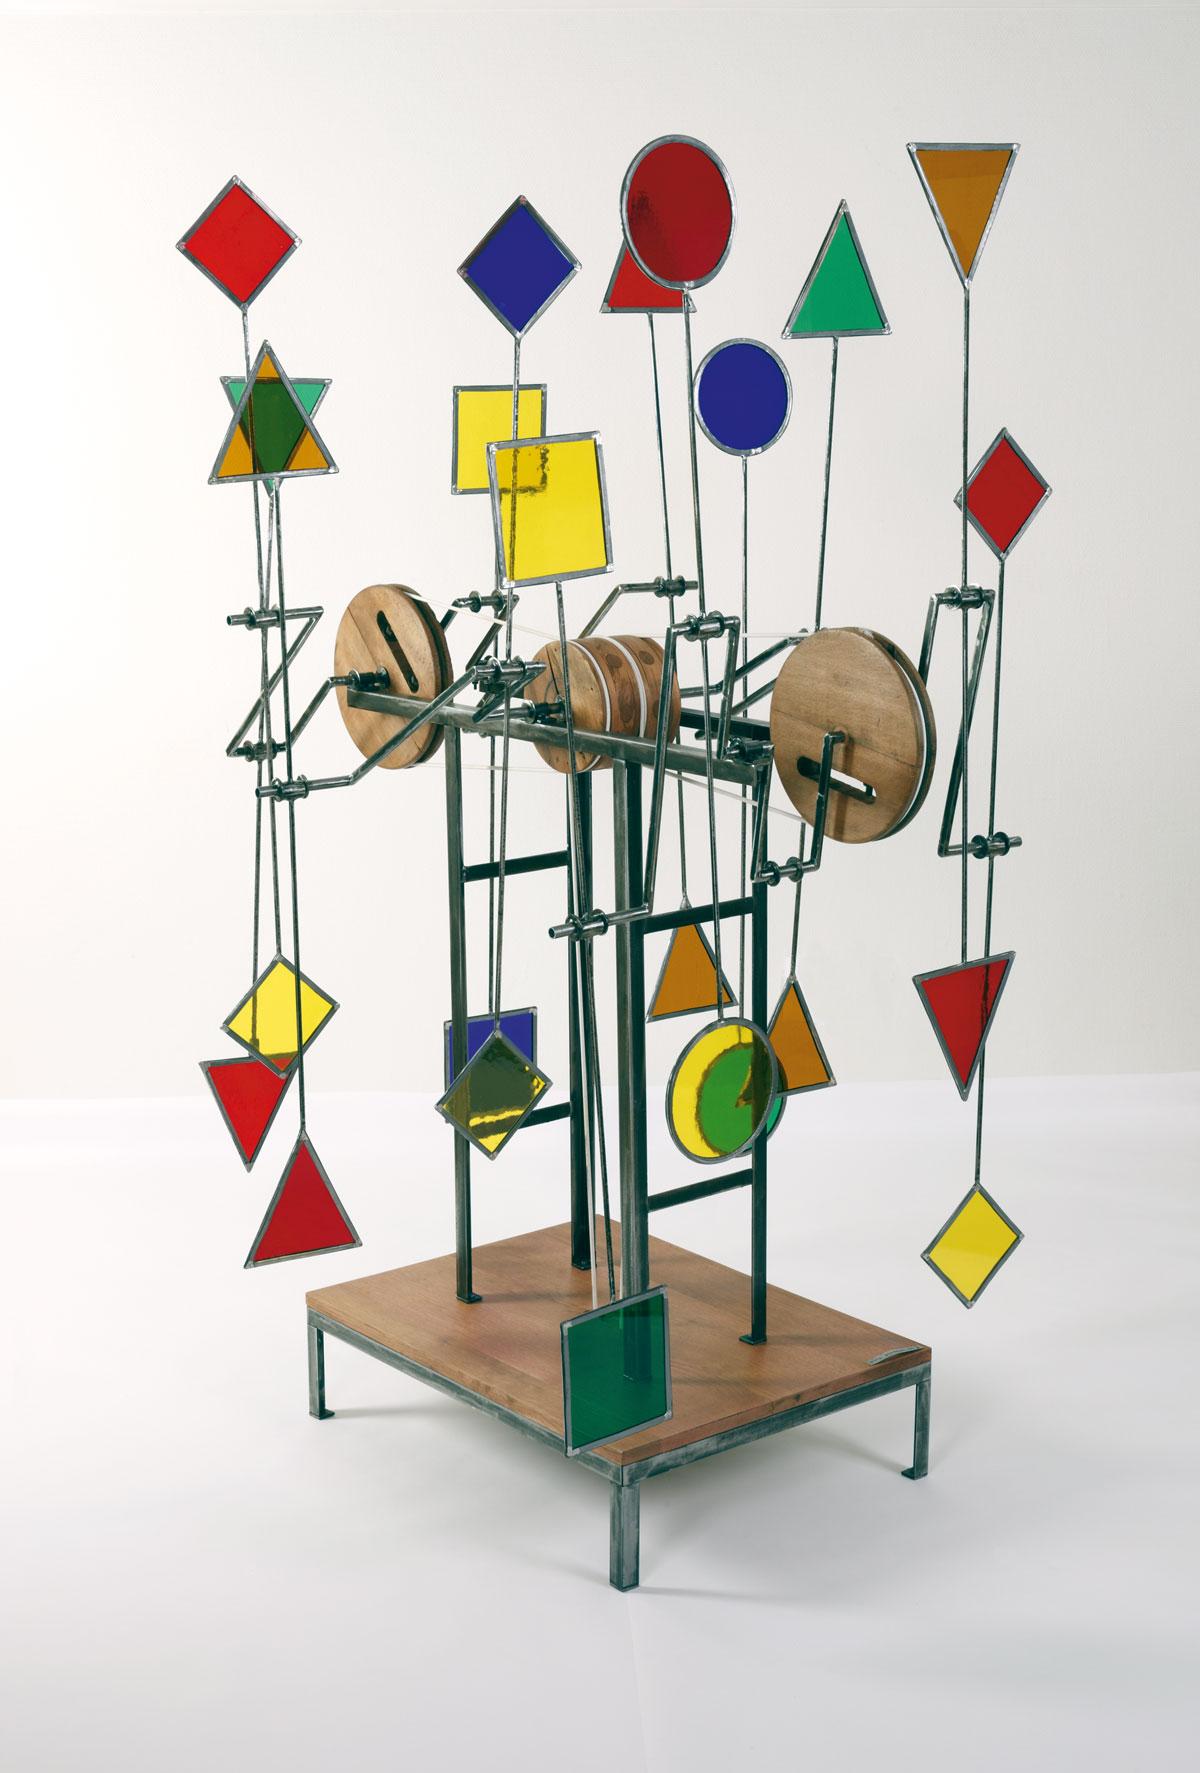 Paul Schnebelen - Combinaison lumineuse, 2009